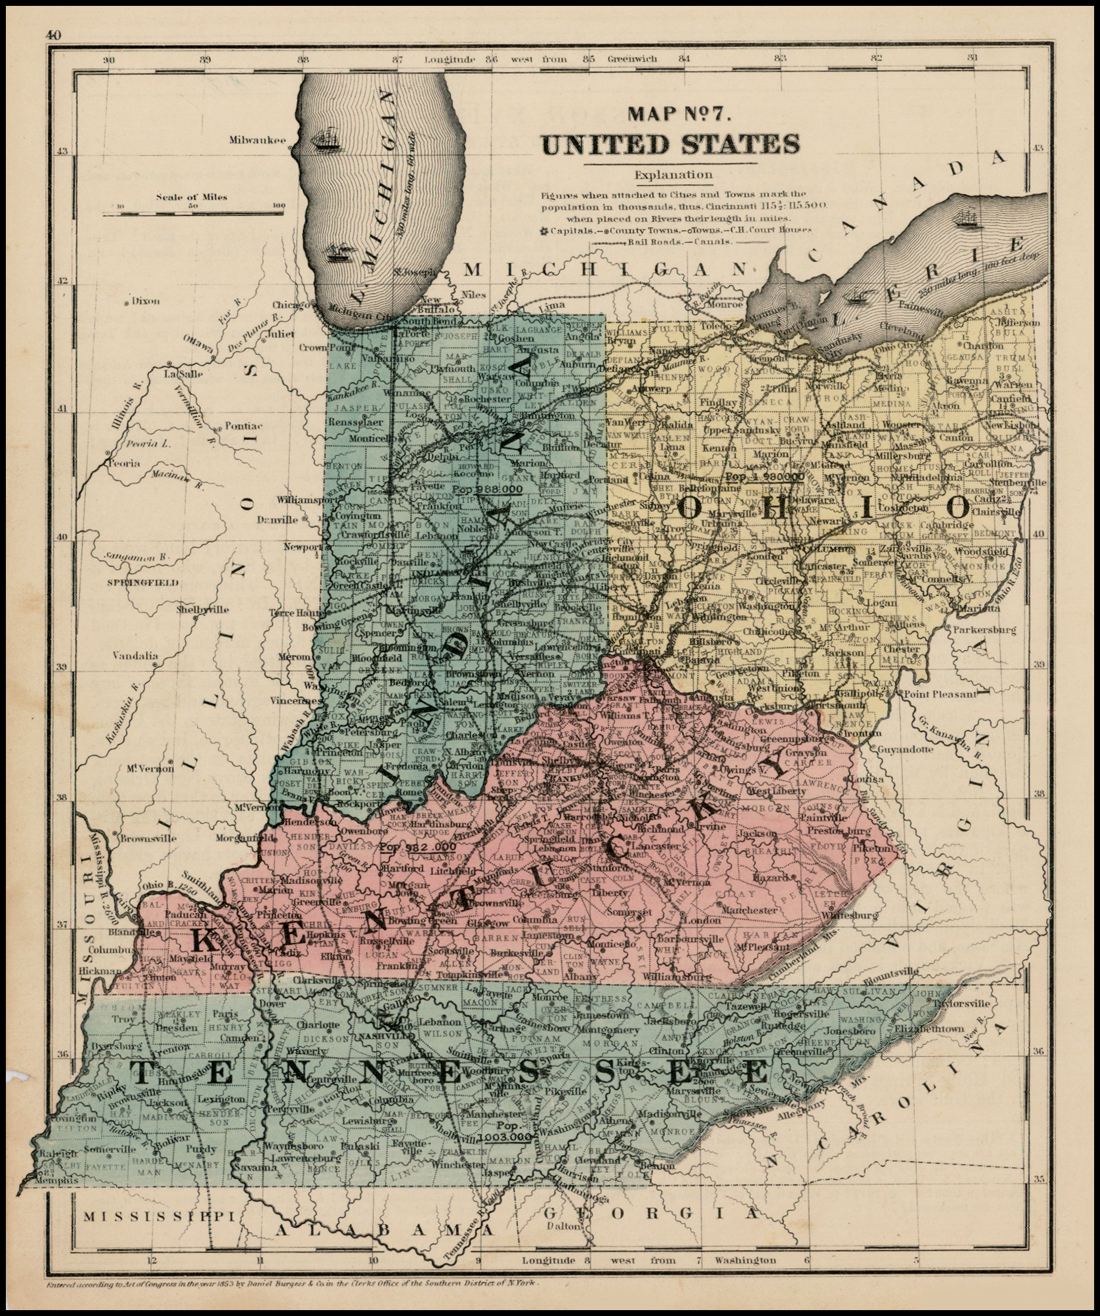 Map No. 7 [Indiana, Ohio, Kentucky, Tennessee, Lake Michigan ... Kentucky Tennessee Map on northeastern tennessee map, wears valley tennessee map, paducah tennessee map, south carolina tennessee map, london tennessee map, new mexico tennessee map, whites creek tennessee map, dallas tennessee map, portland tennessee map, tennessee county map, dyersville tennessee map, austin tennessee map, wyoming tennessee map, tennessee state map, beech grove tennessee map, bryson city tennessee map, belle meade tennessee map, somerset tennessee map, mayfield tennessee map, marion tennessee map,